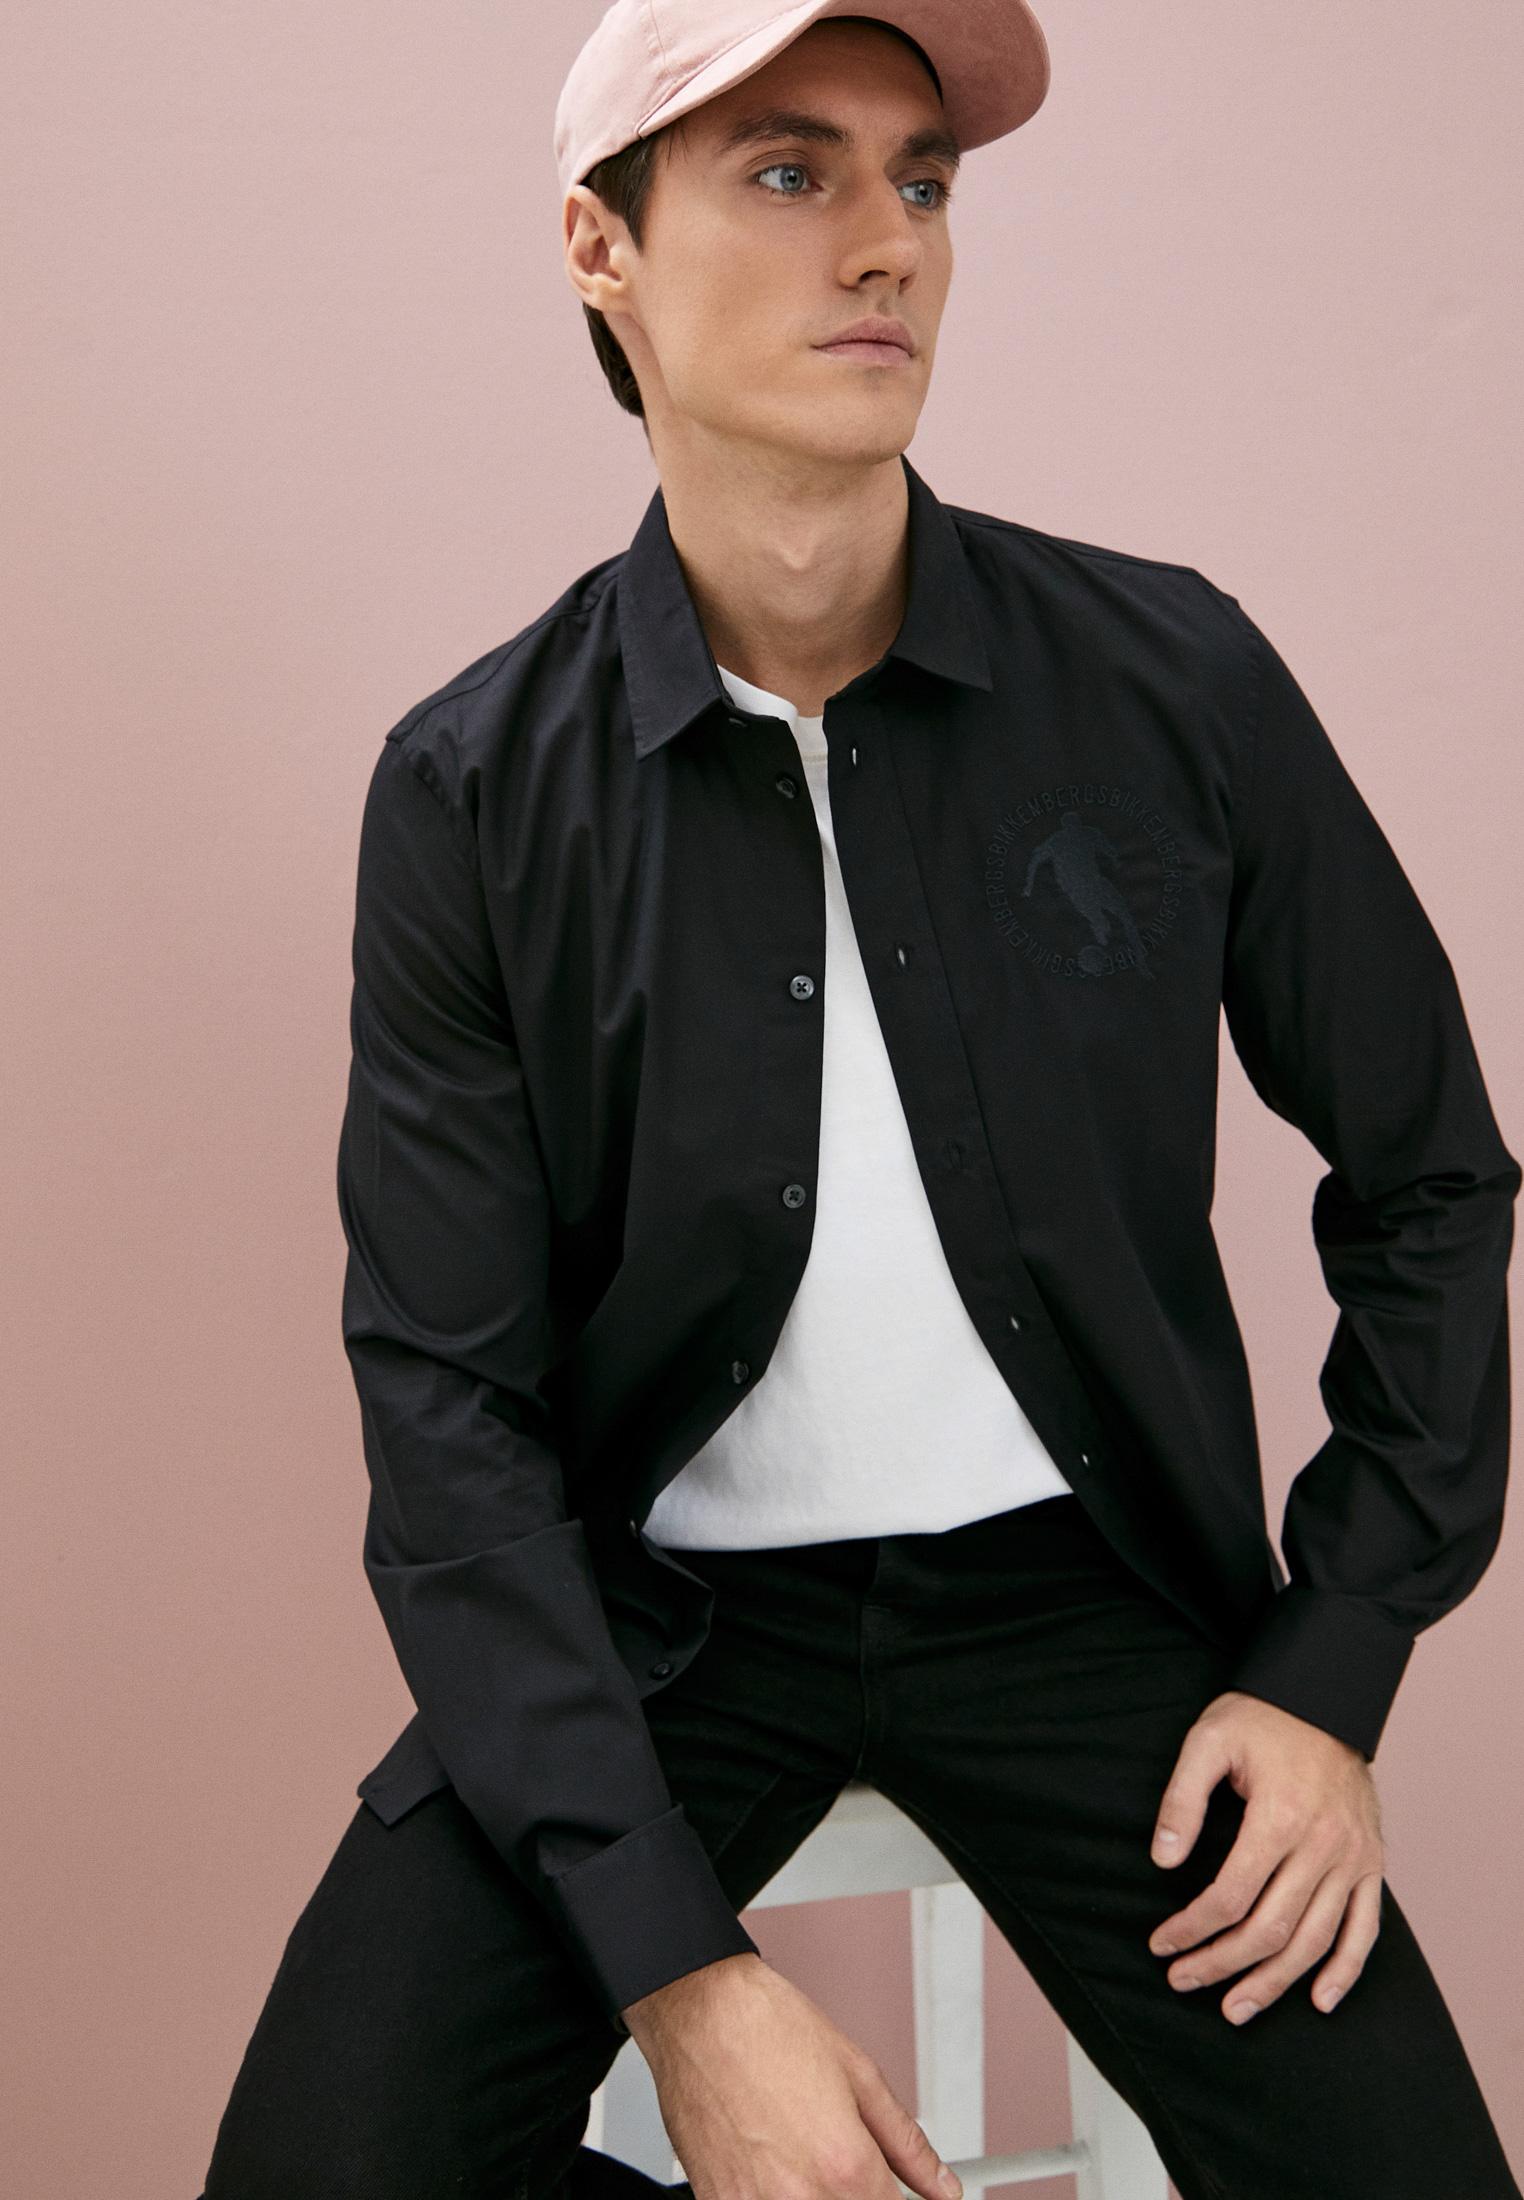 Рубашка с длинным рукавом Bikkembergs (Биккембергс) C C 009 2C S 2931: изображение 2